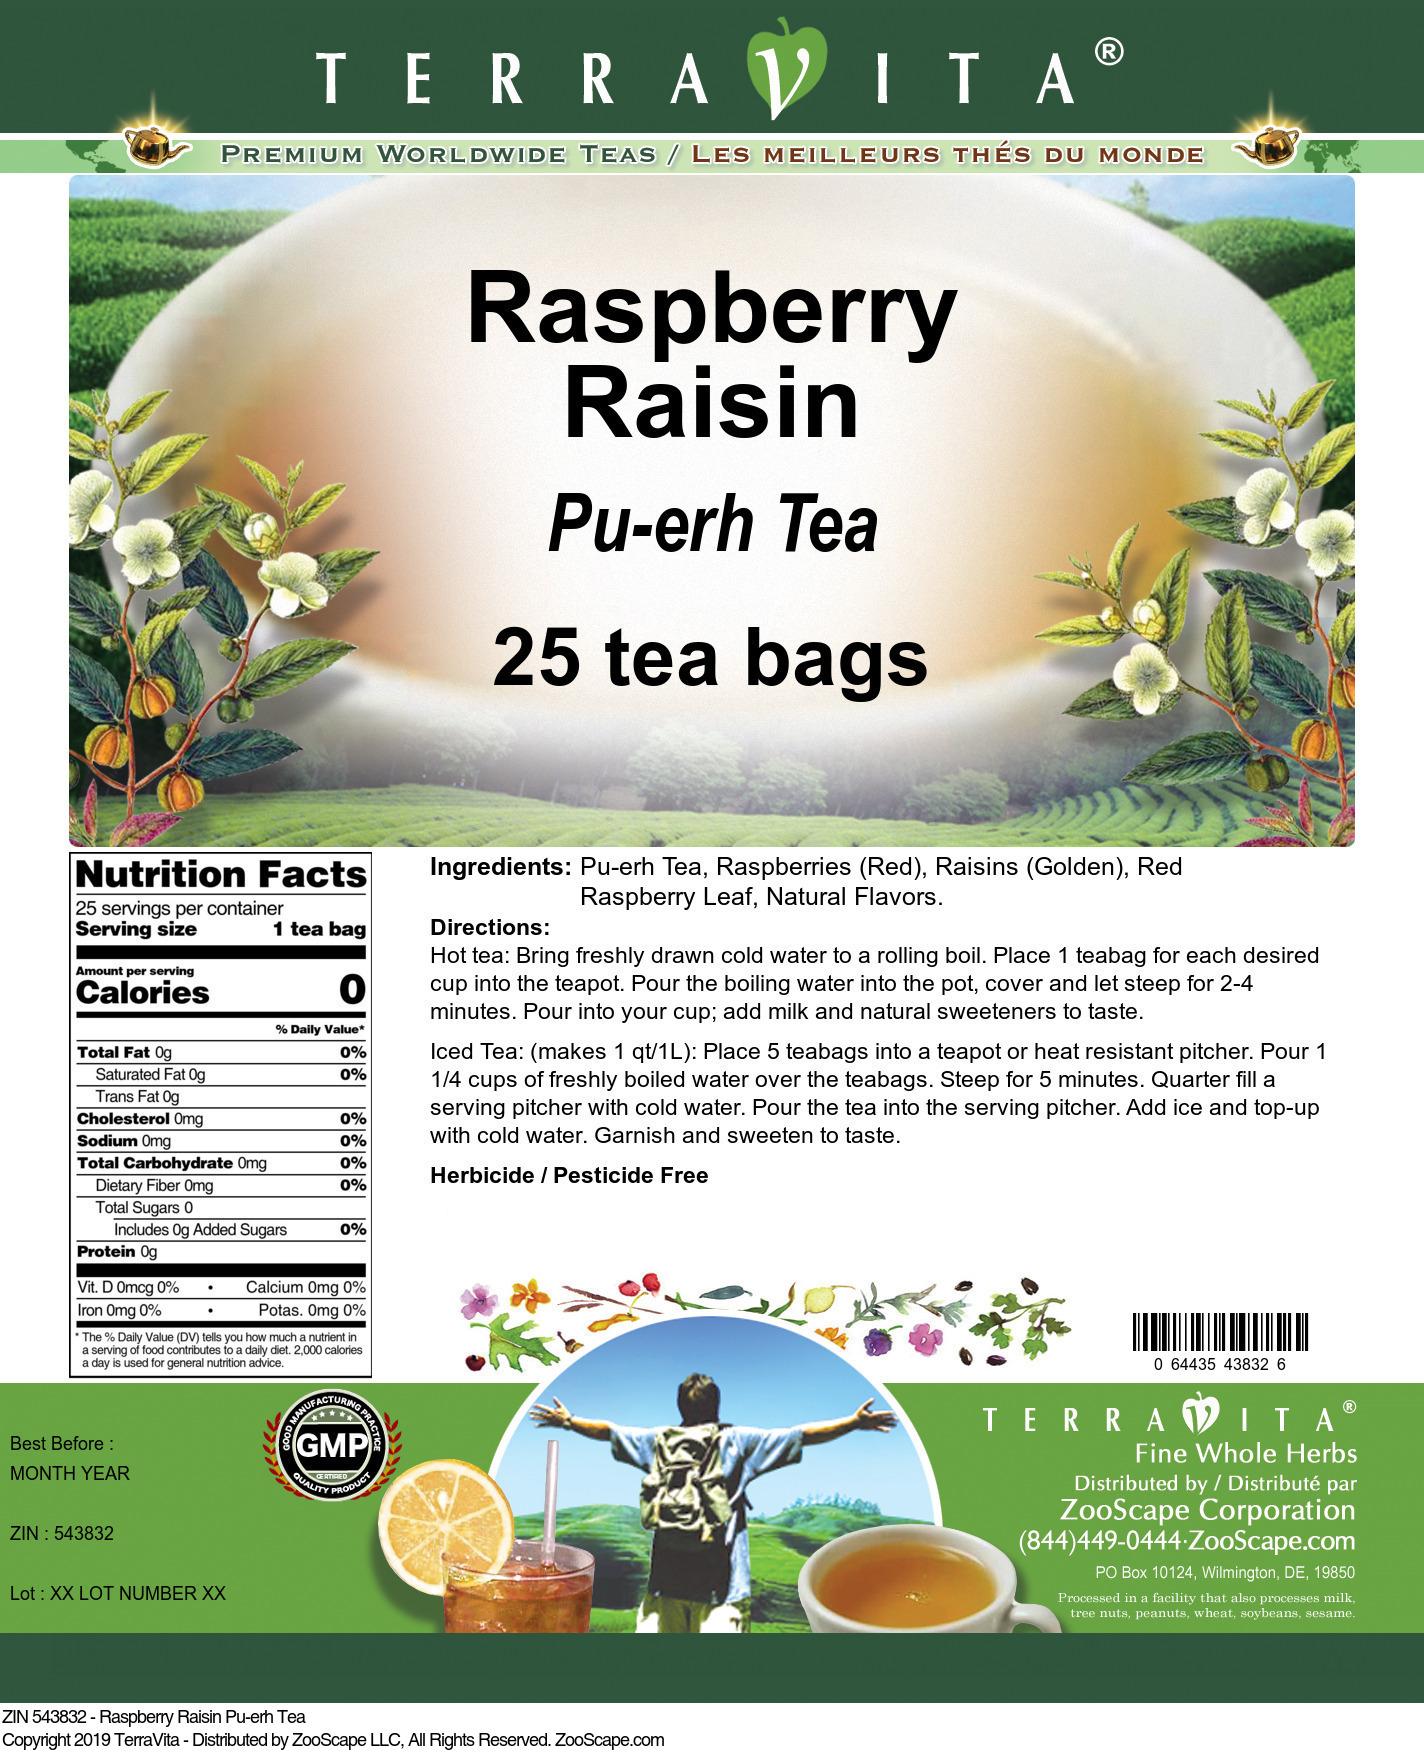 Raspberry Raisin Pu-erh Tea